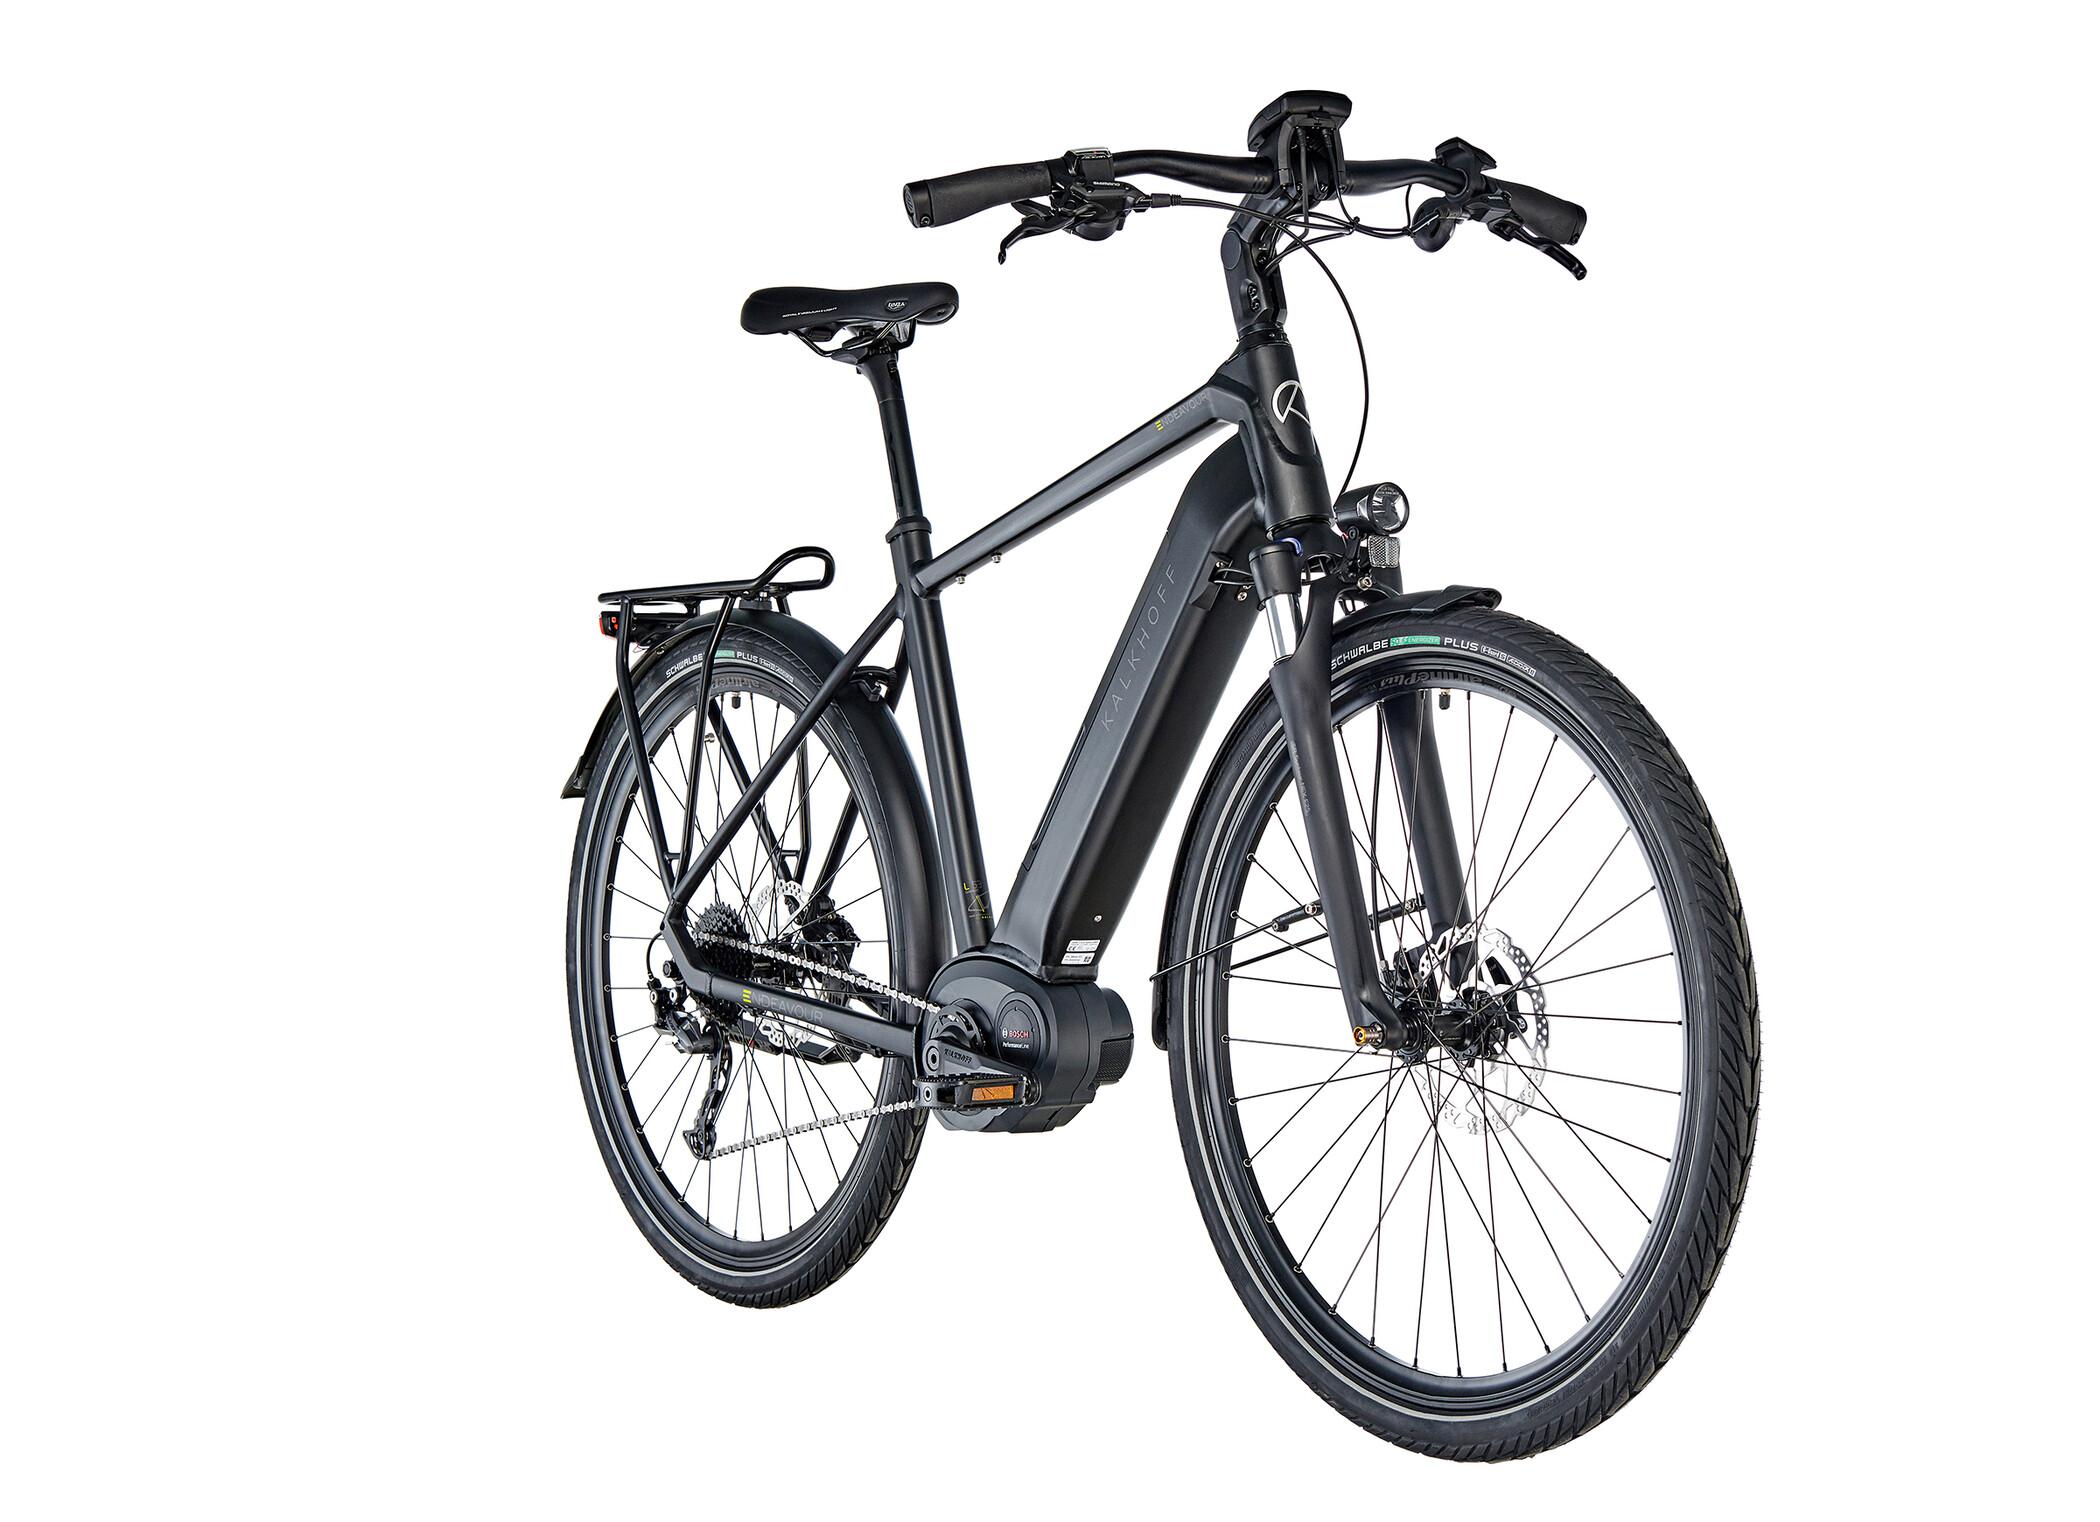 Kalkhoff Endeavour 5.B XXL E-trekkingcykel Diamant 500Wh sort (2019) | City-cykler